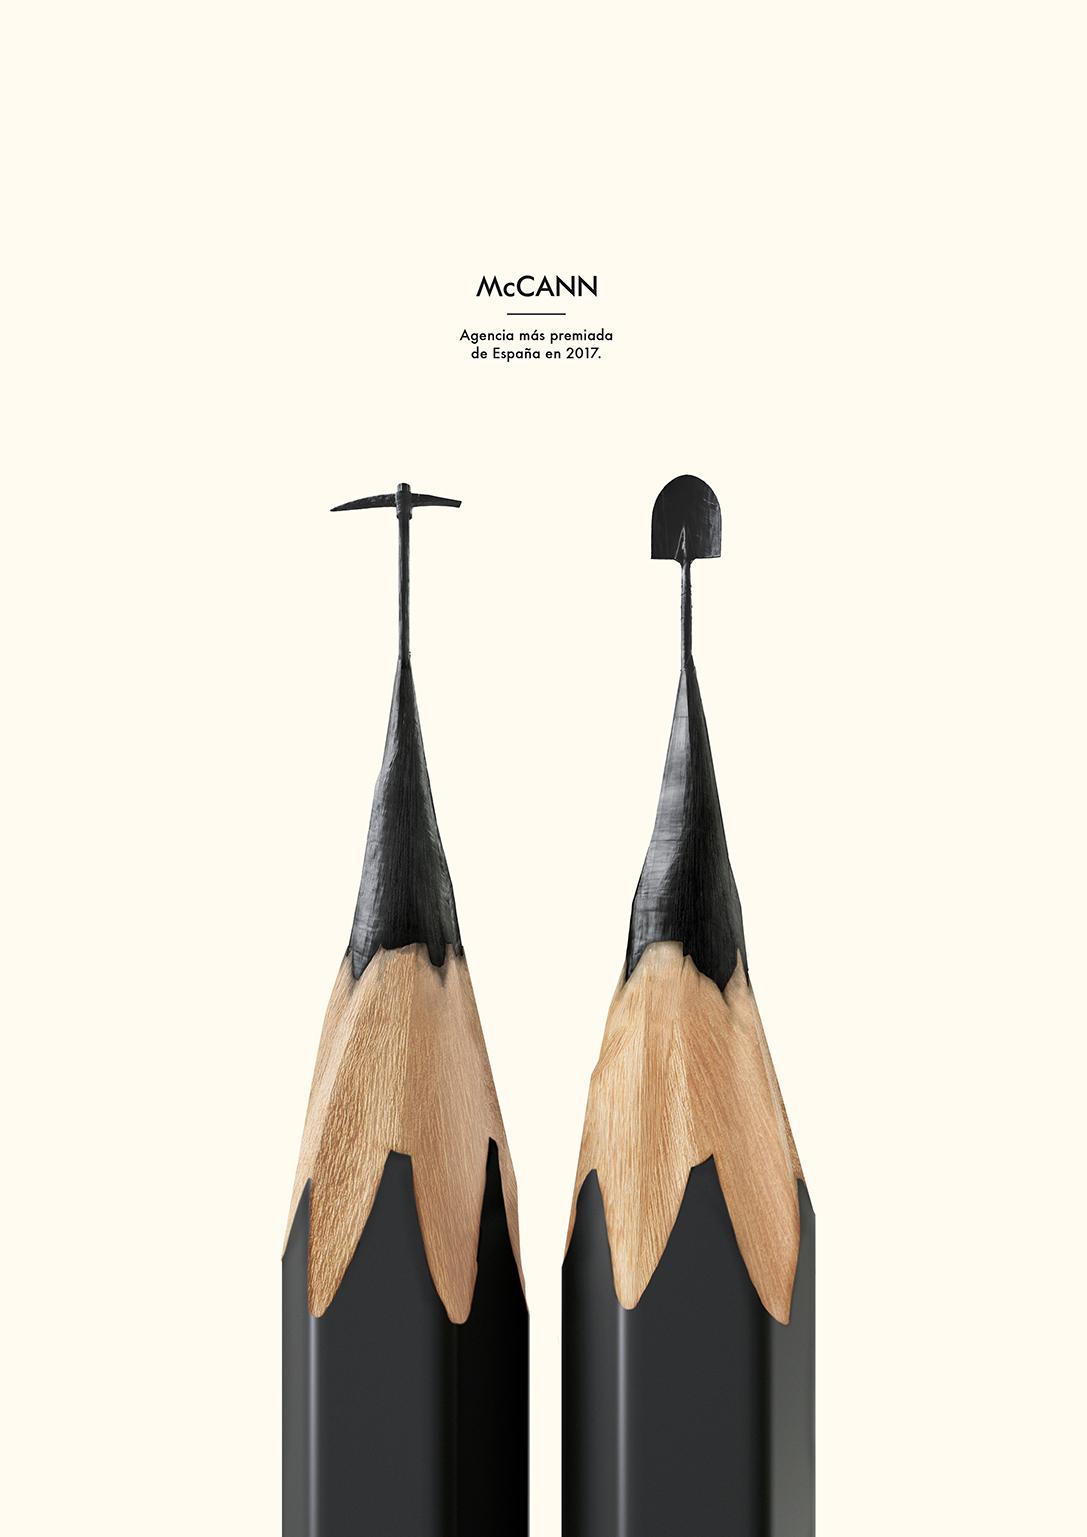 Lapices-Pico-y-Pala-Mccann-para-A2-V2-CAPAS